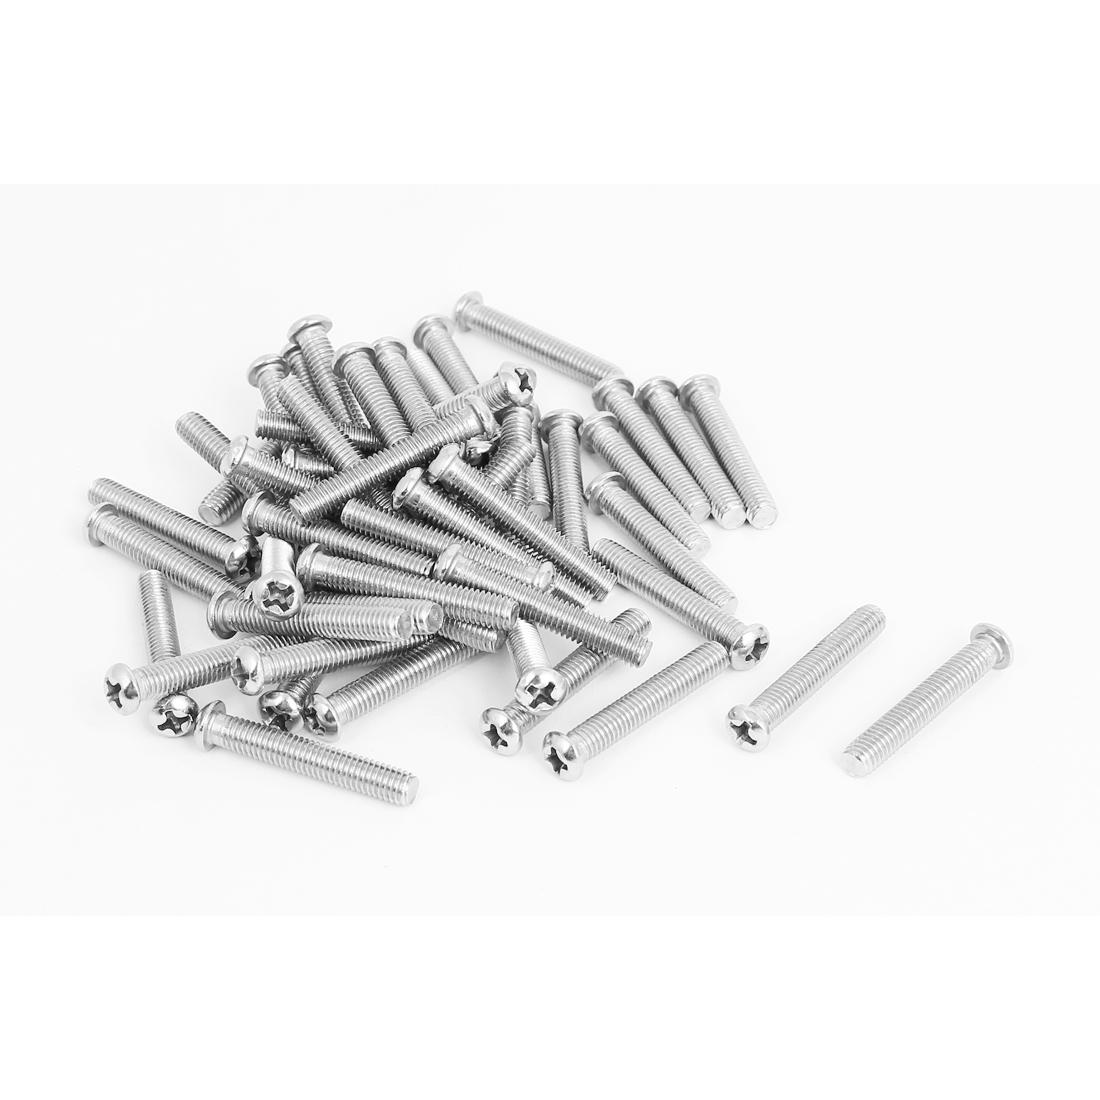 M5x30mm Stainless Steel Phillips Round Pan Head Machine Screws 50pcs